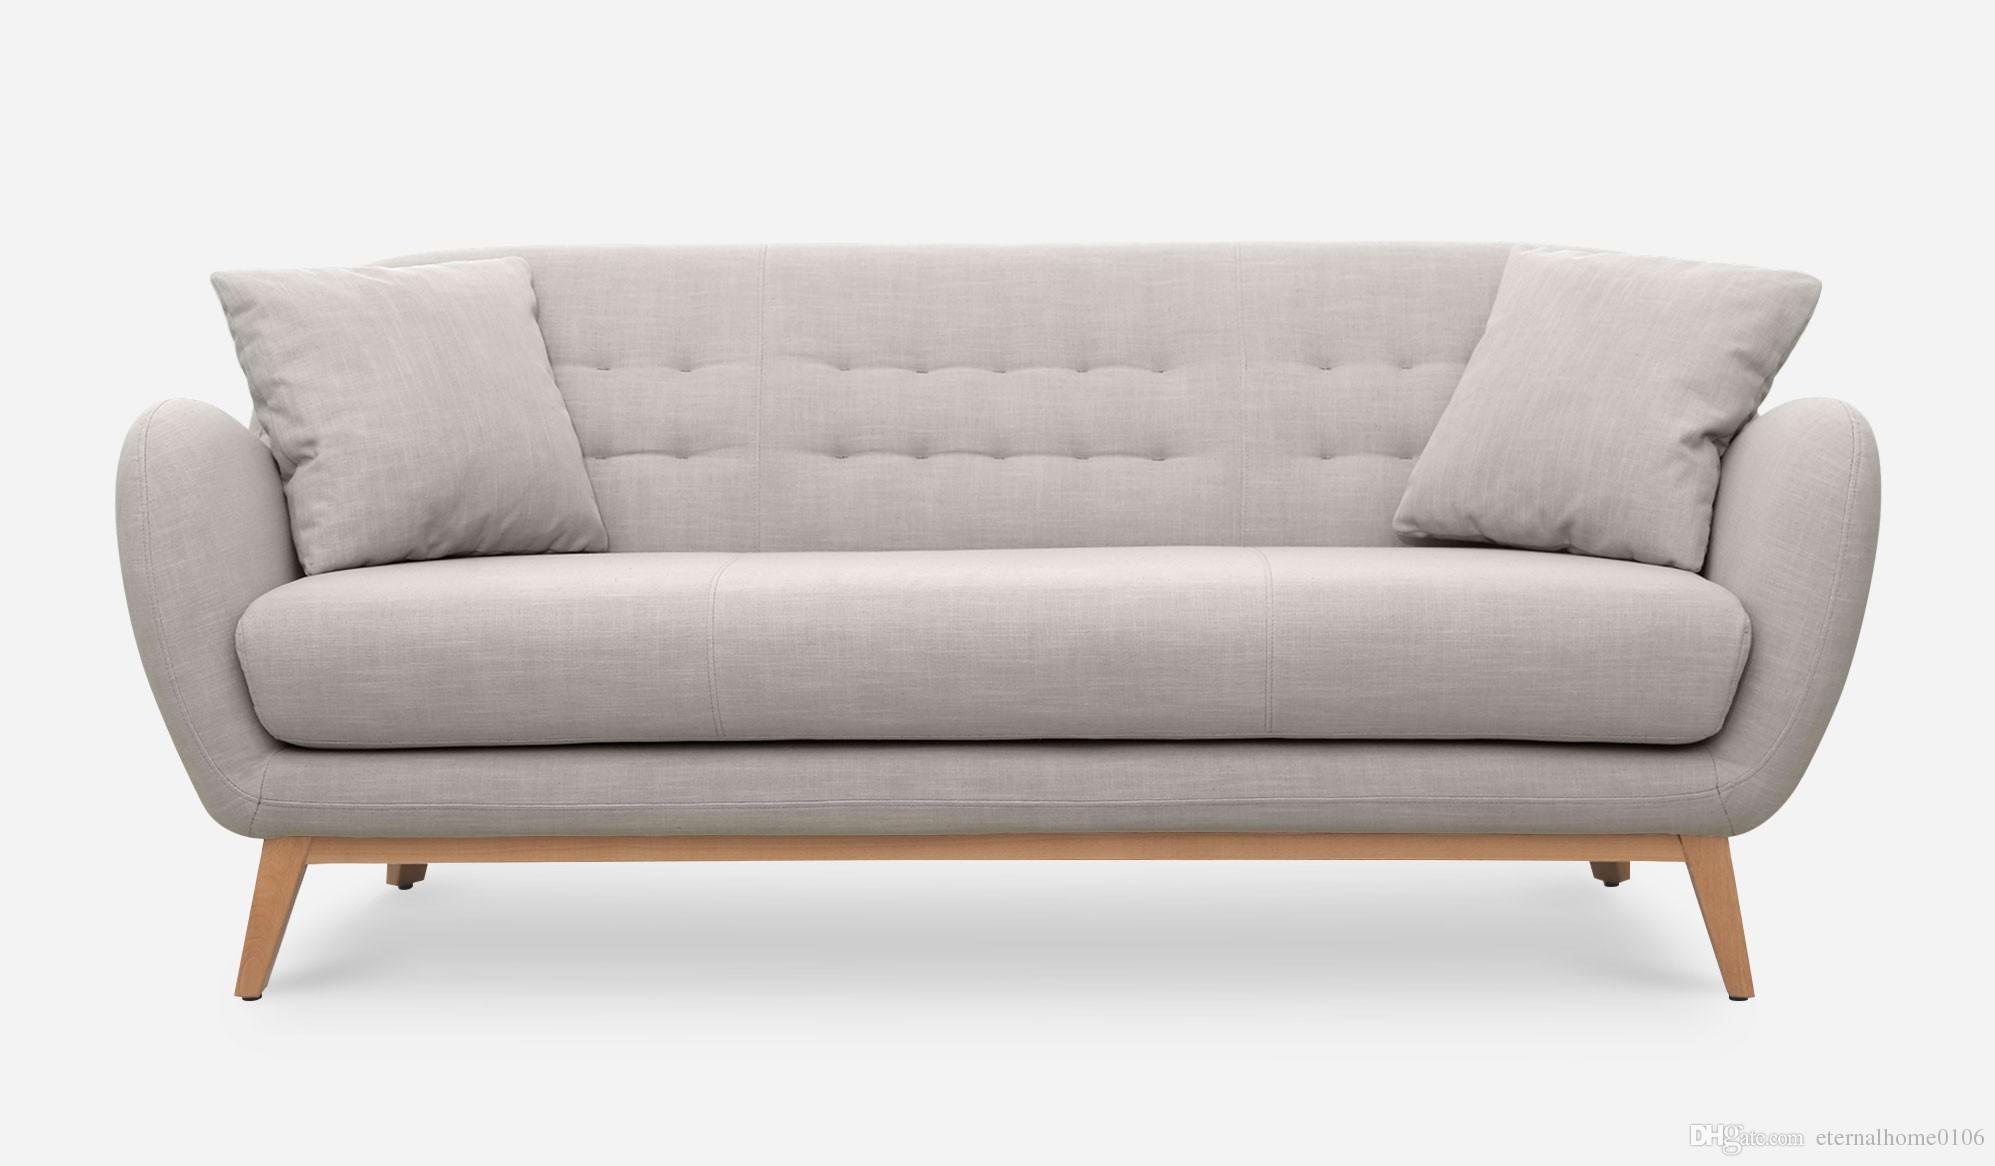 2018 Mid Century Modern Loveseats Furniture Ottoman Living Room Bedroom  Sofa Armchair Fabric Velvet 030 From Eternalhome0106, $1205.03 | Dhgate.Com